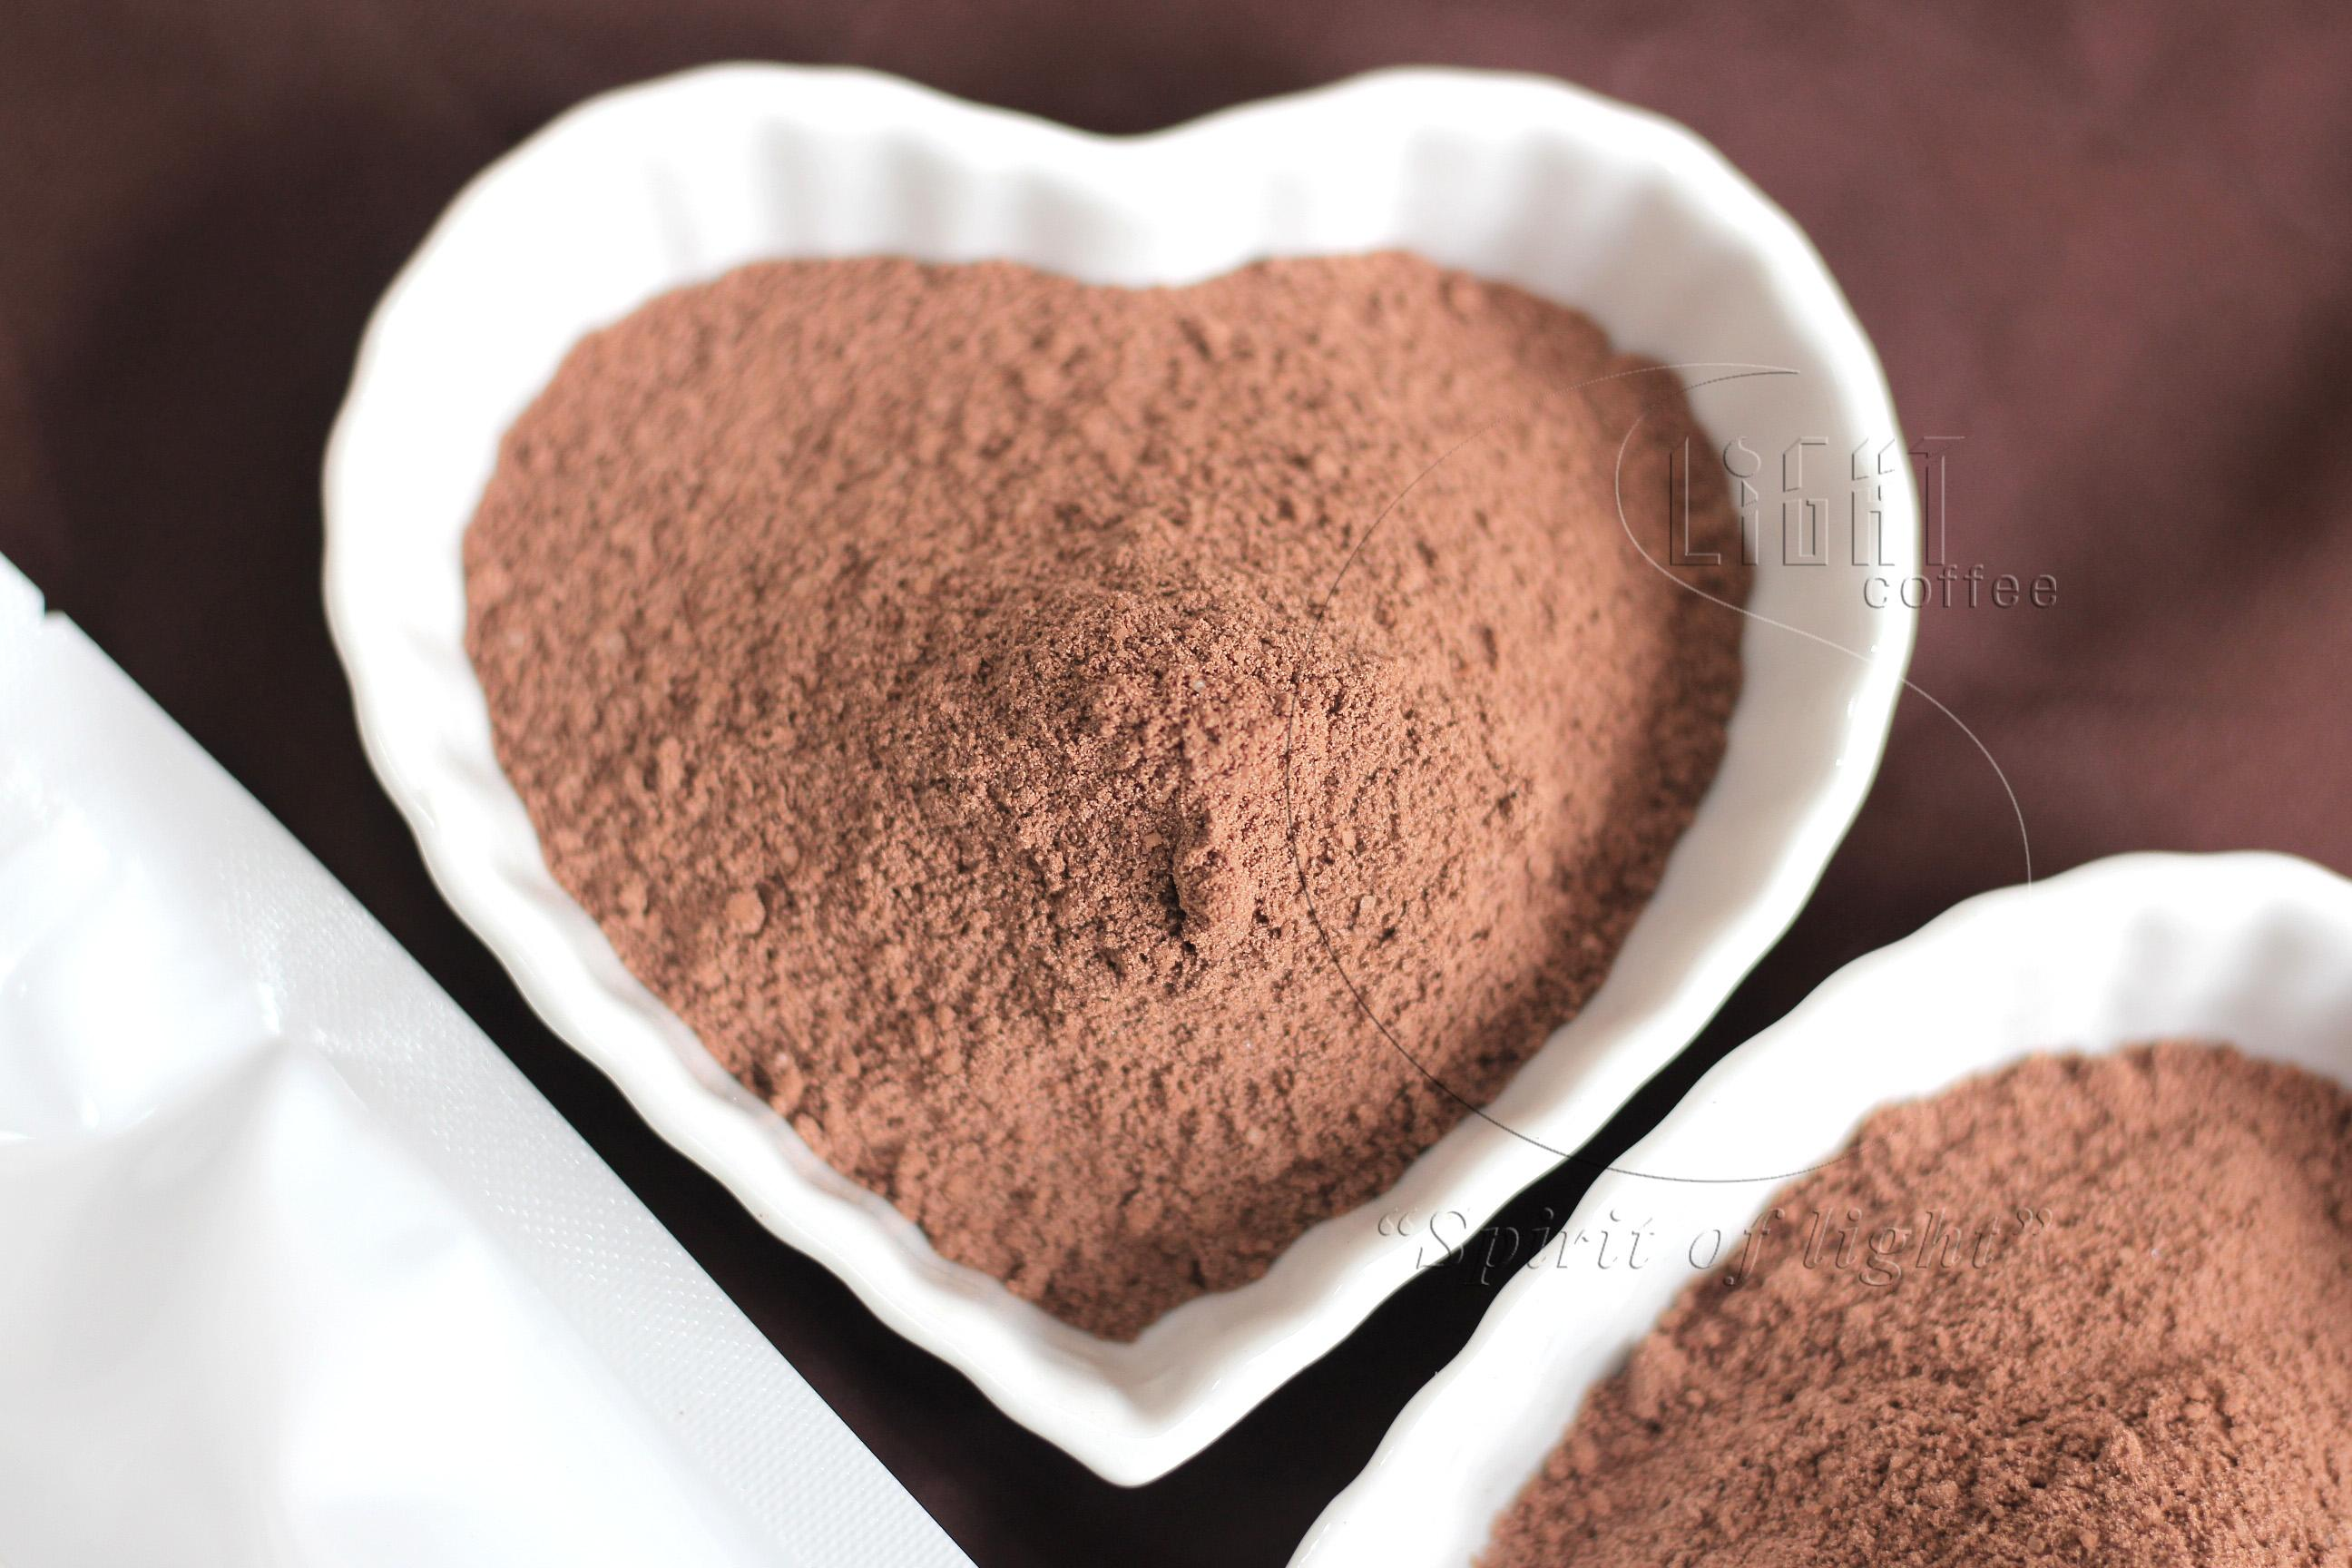 cacao nguyên chất Light Cacao